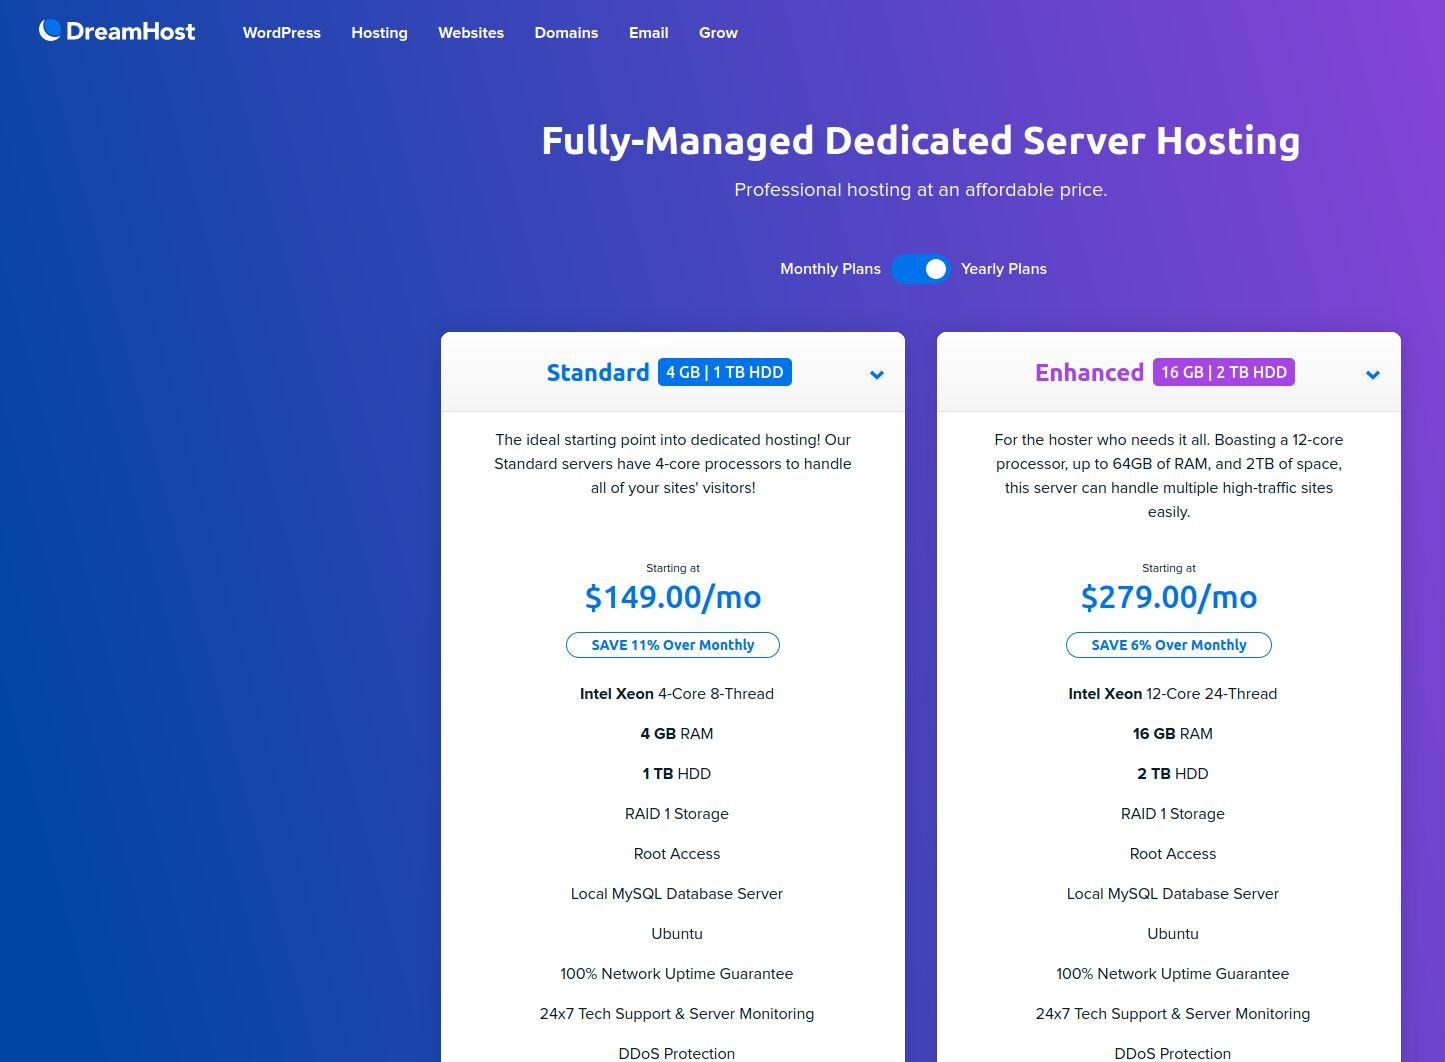 dreamhost Fully Managed Dedicated Server Hosting